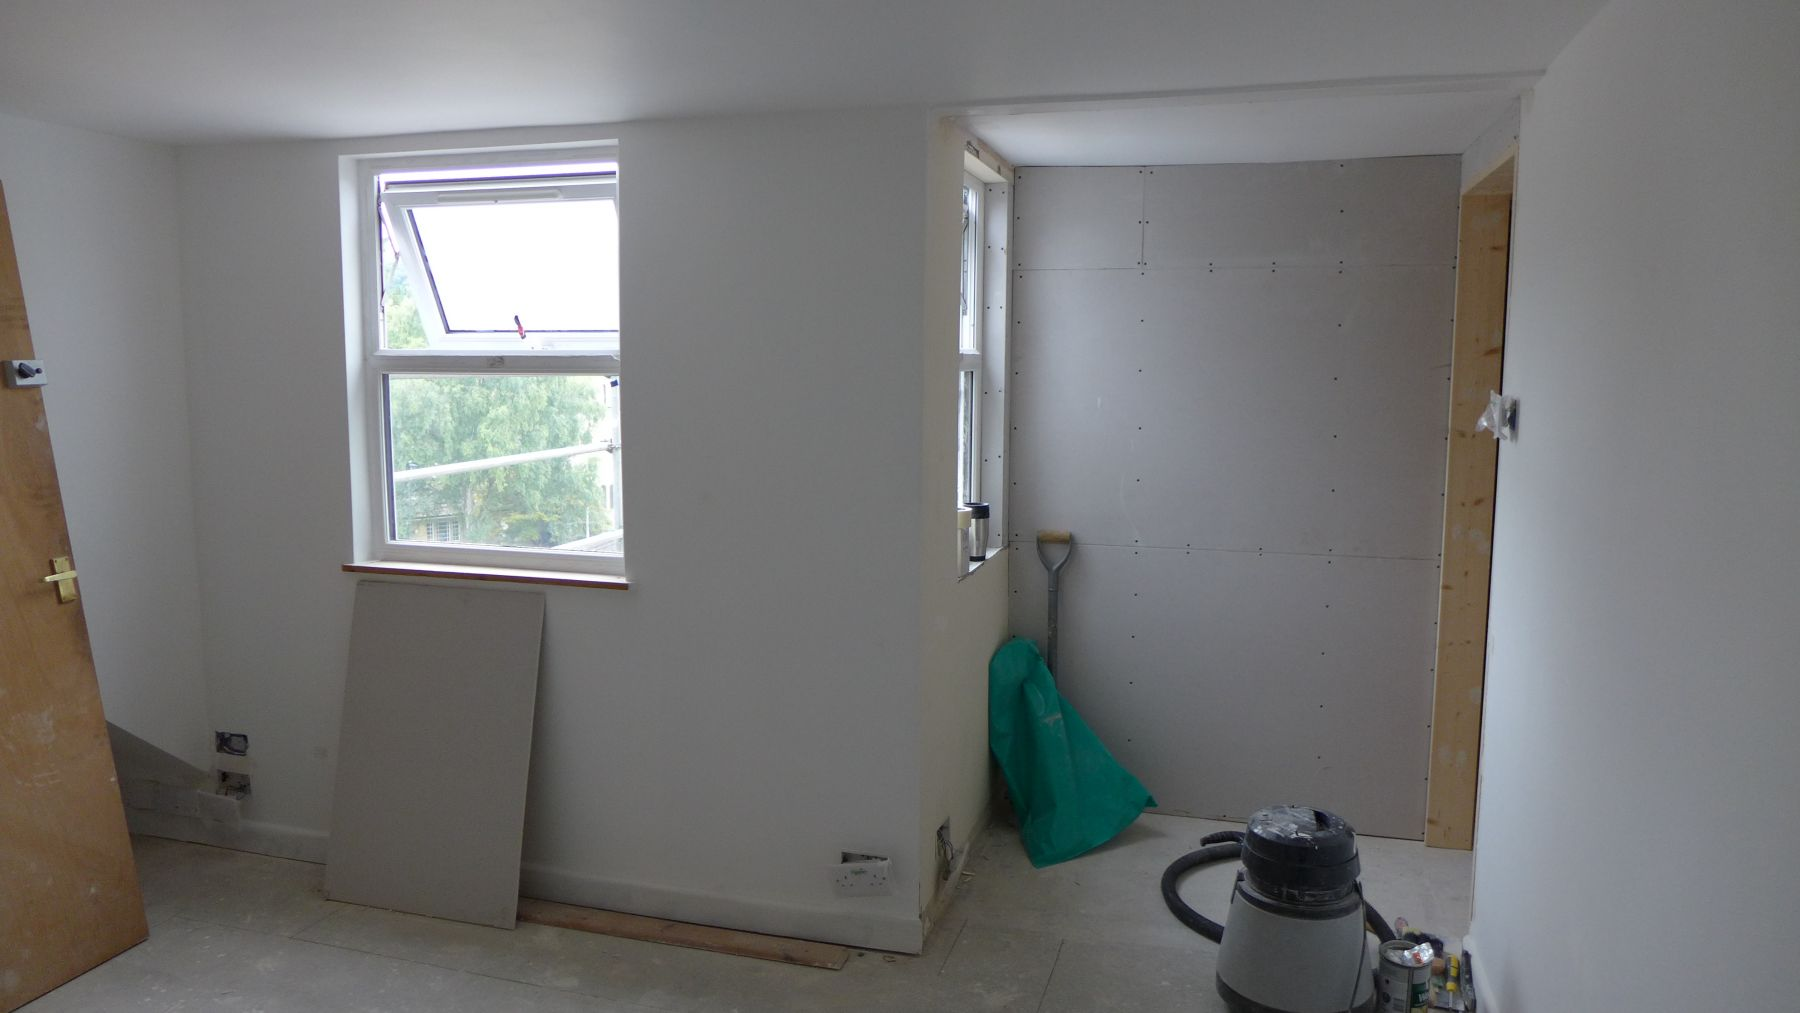 creating attic room with en-suite